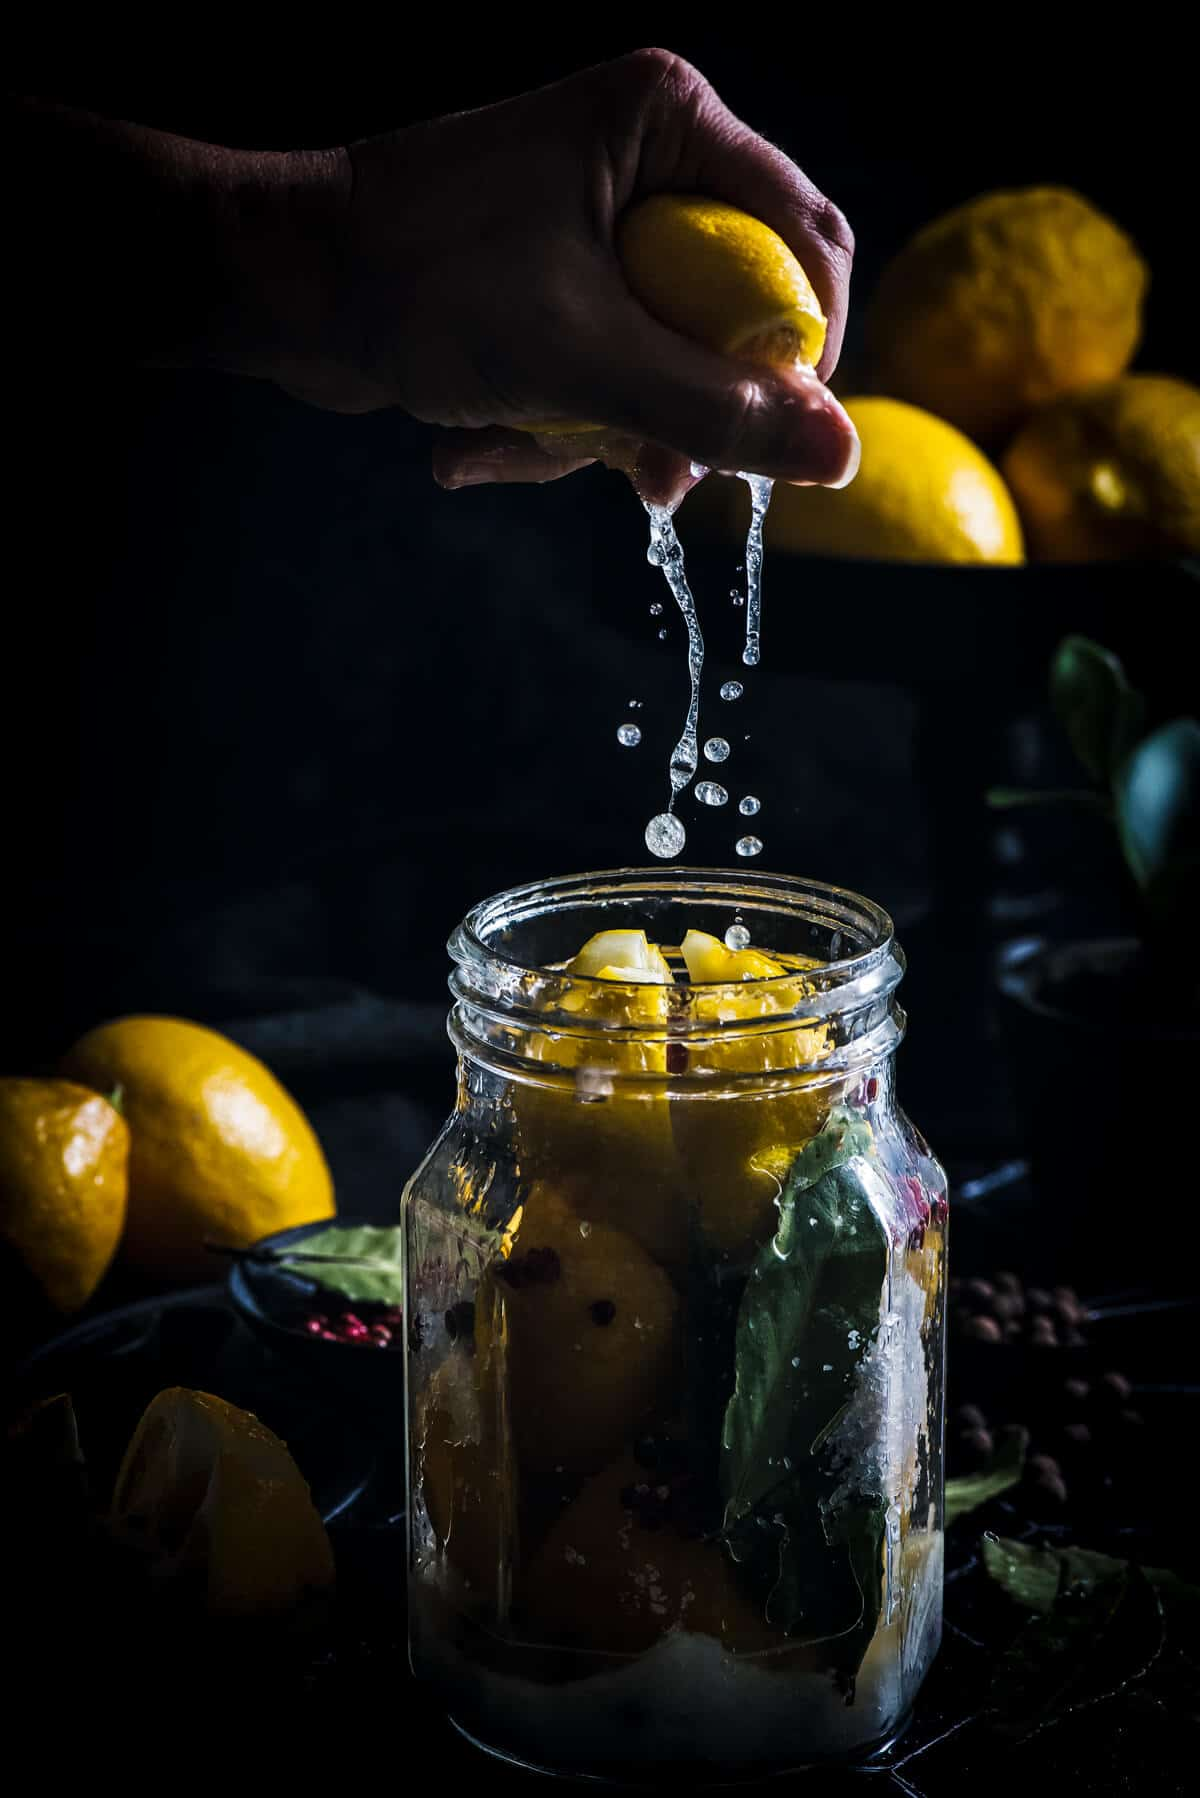 How to Make Preserved Lemons Recipe